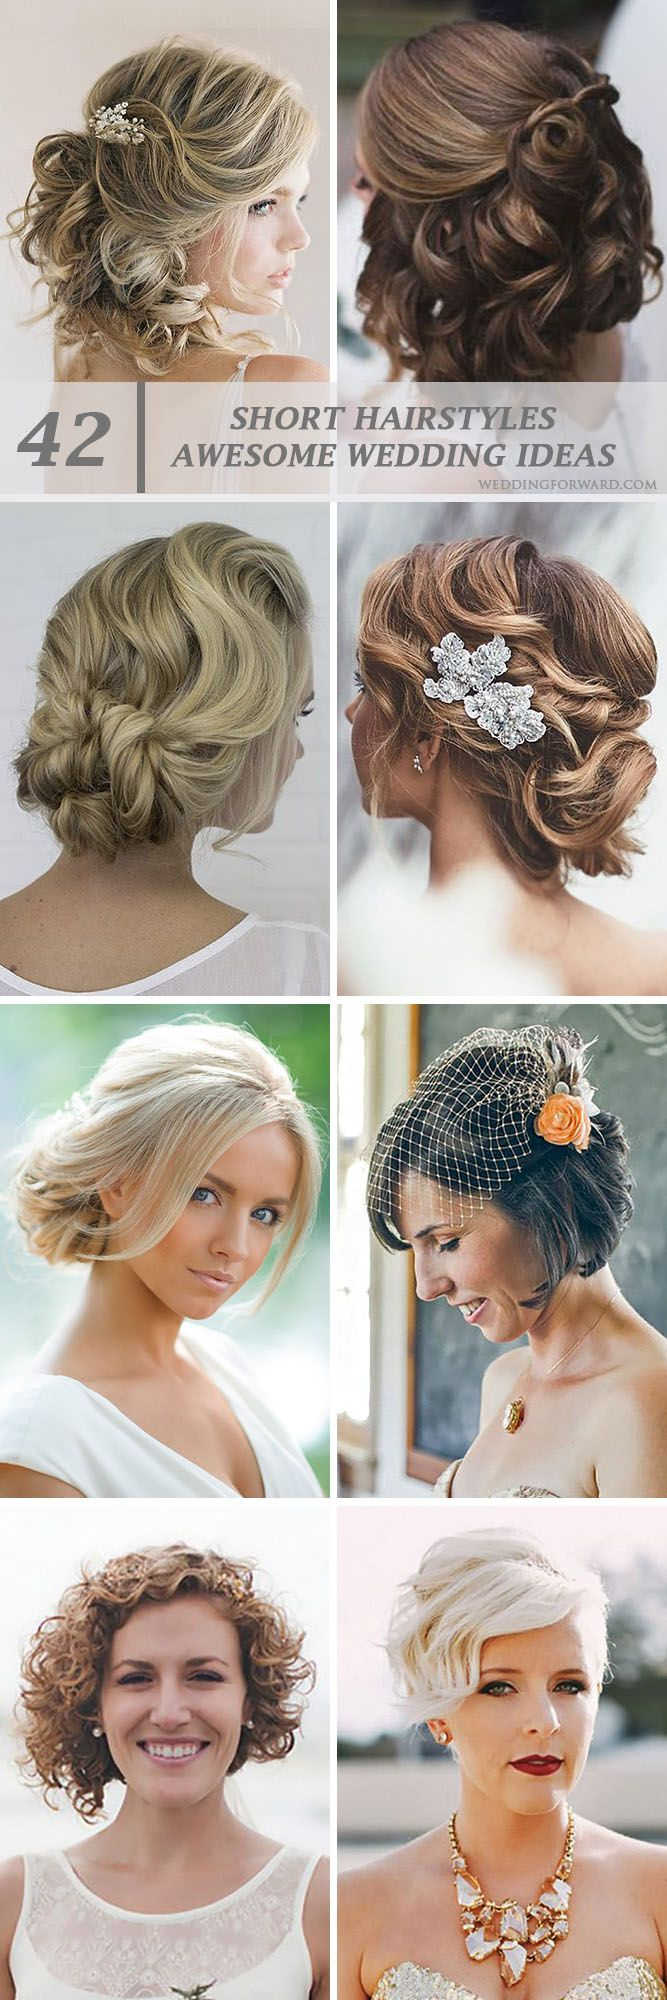 The 25+ best Short wedding hairstyles ideas on Pinterest